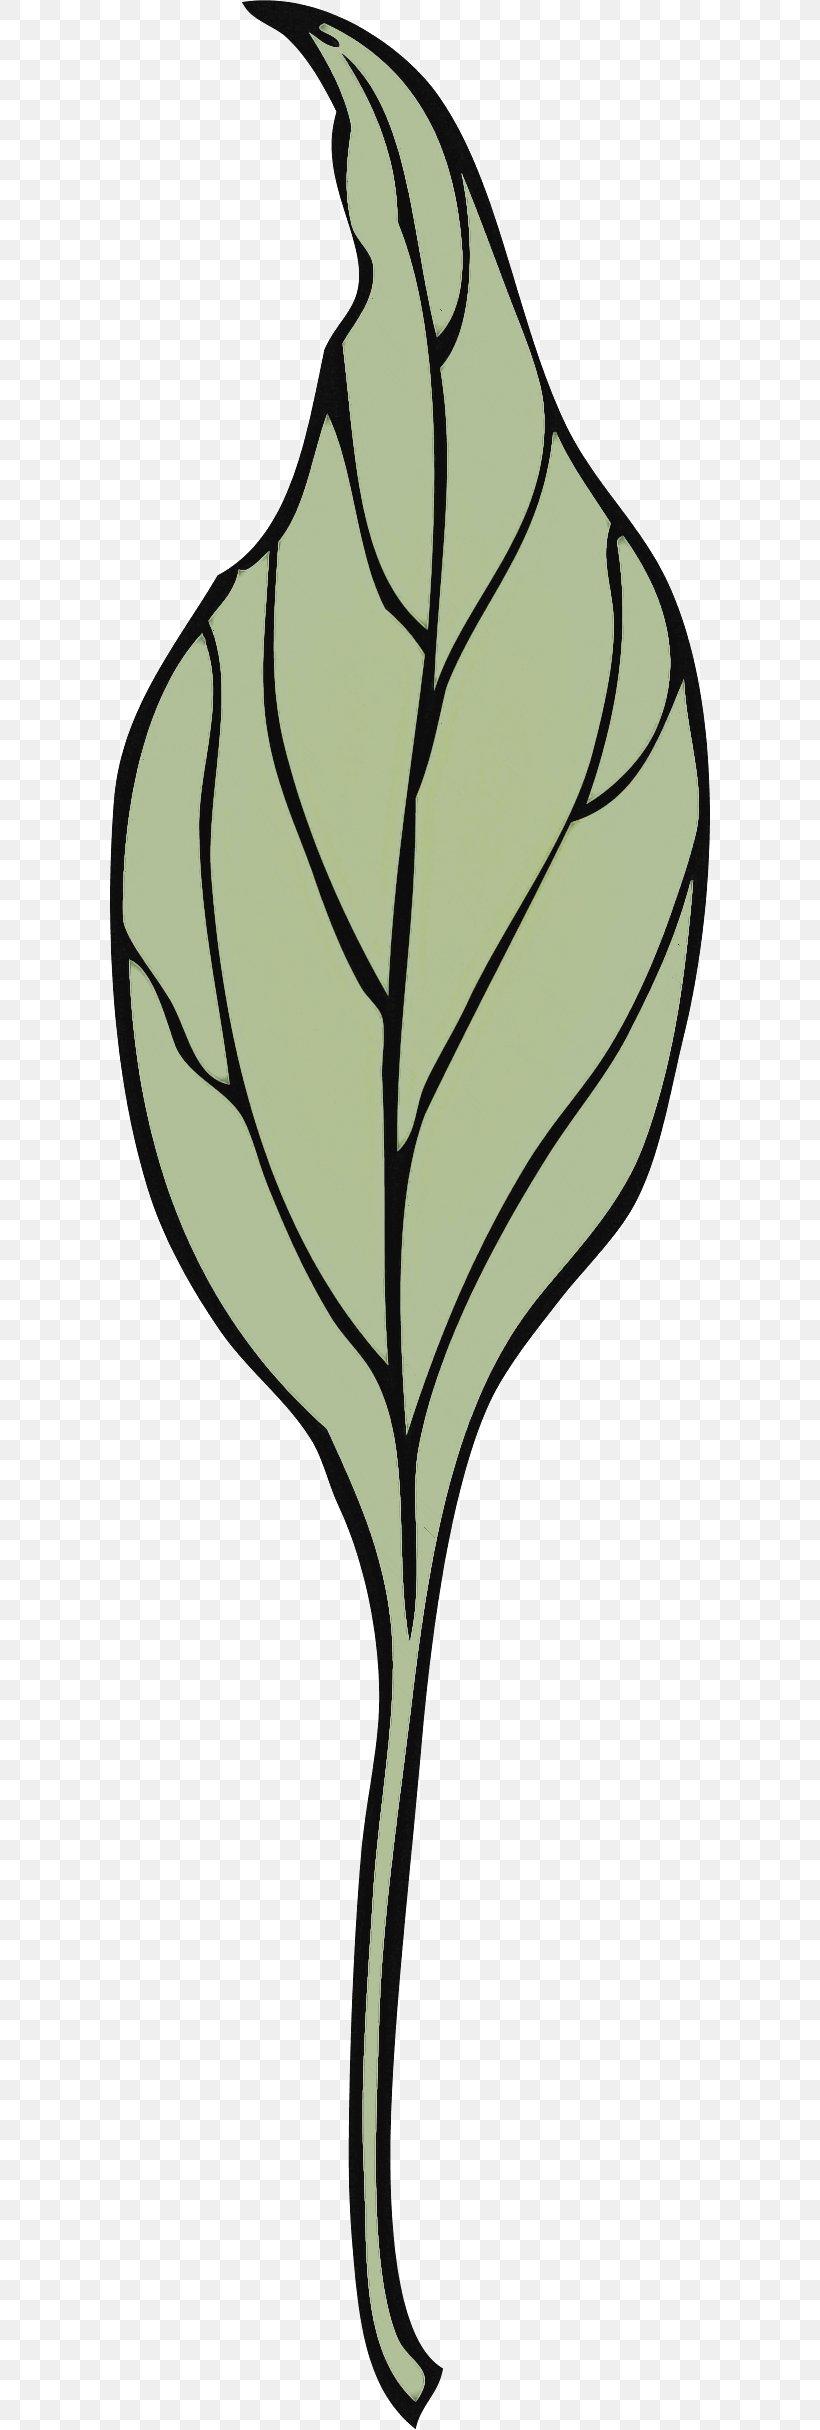 Leaf Plant Tree Flower Plant Stem, PNG, 600x2430px, Leaf, Blackandwhite, Flower, Plant, Plant Stem Download Free